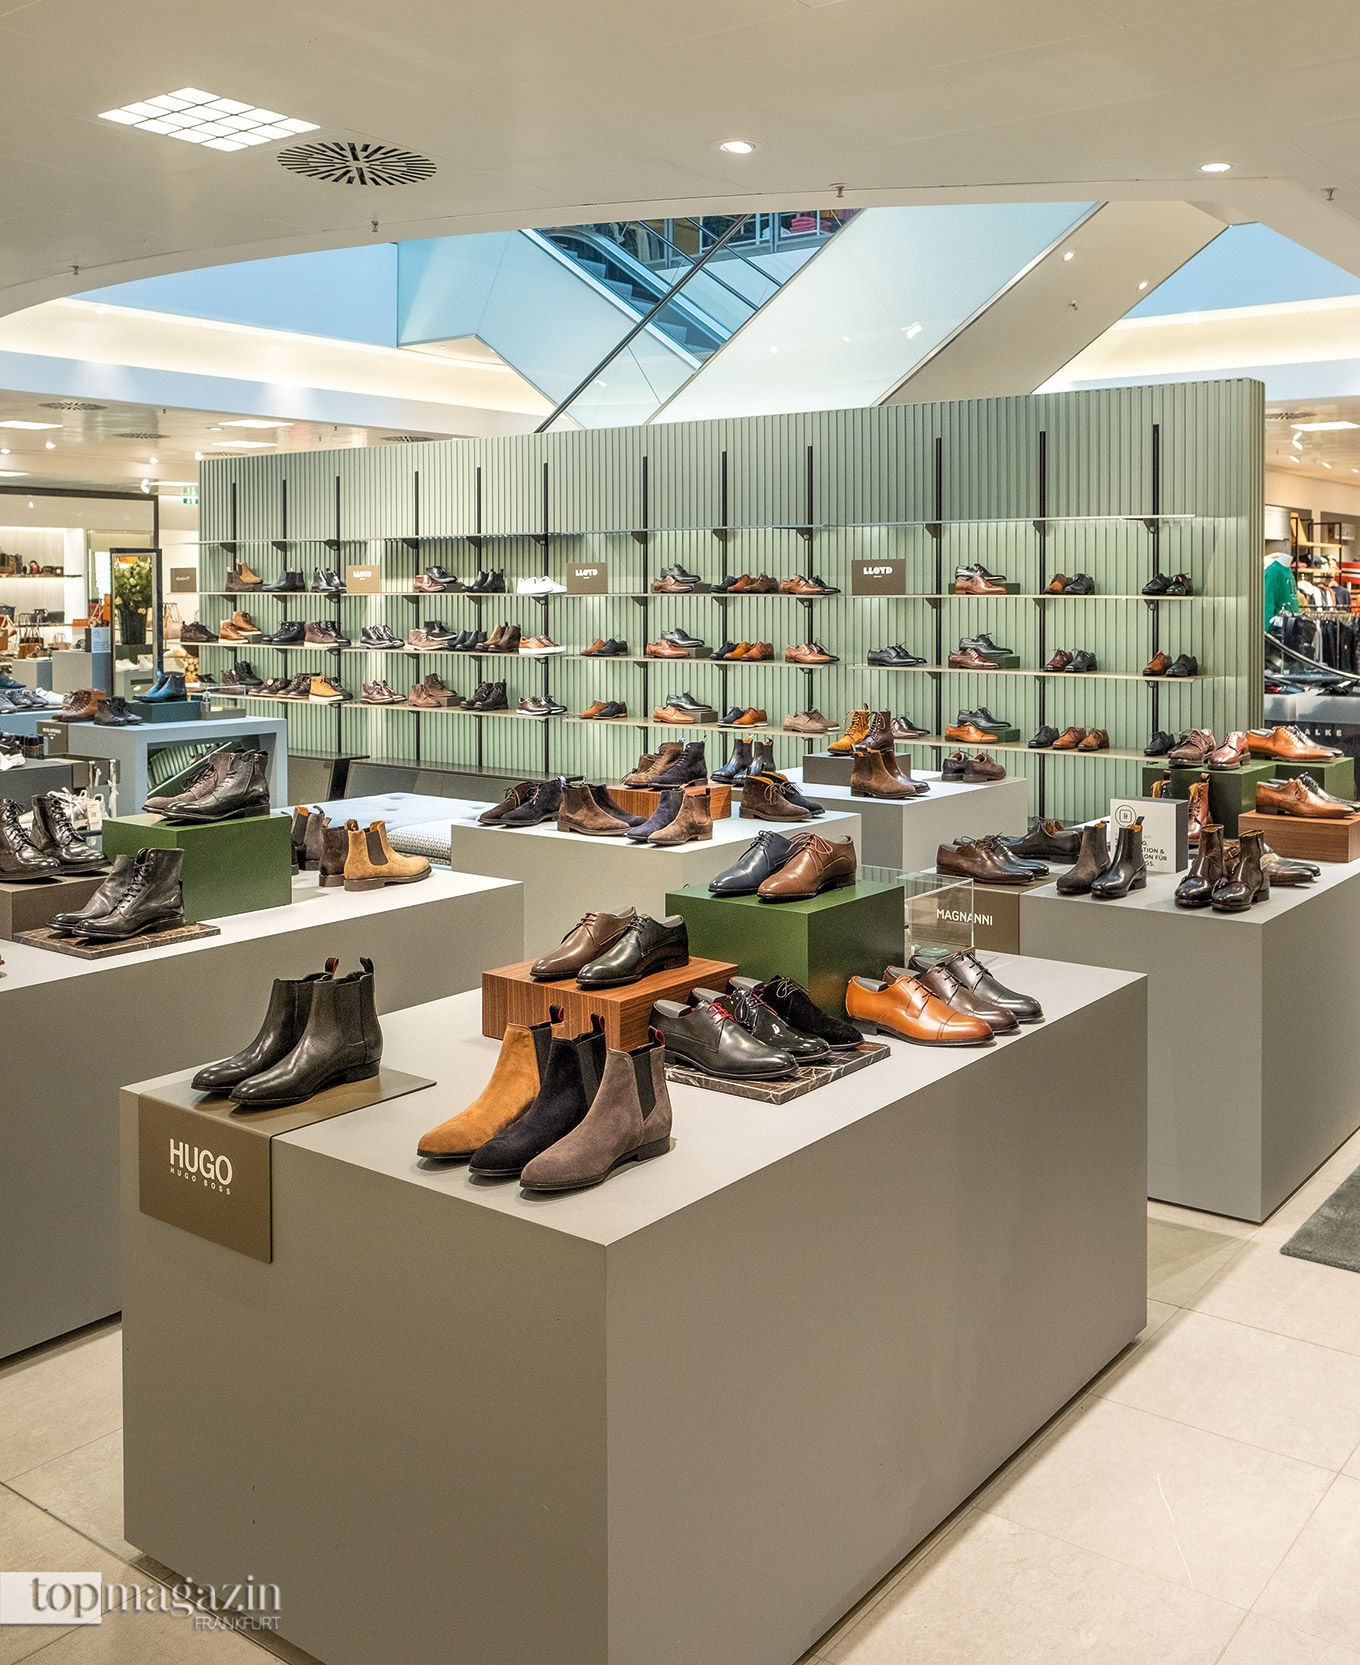 Die Schuhe im Erdgeschoss sind der neuste Blickfang in dem 9.000 Quadratmeter großen Breuninger Haus